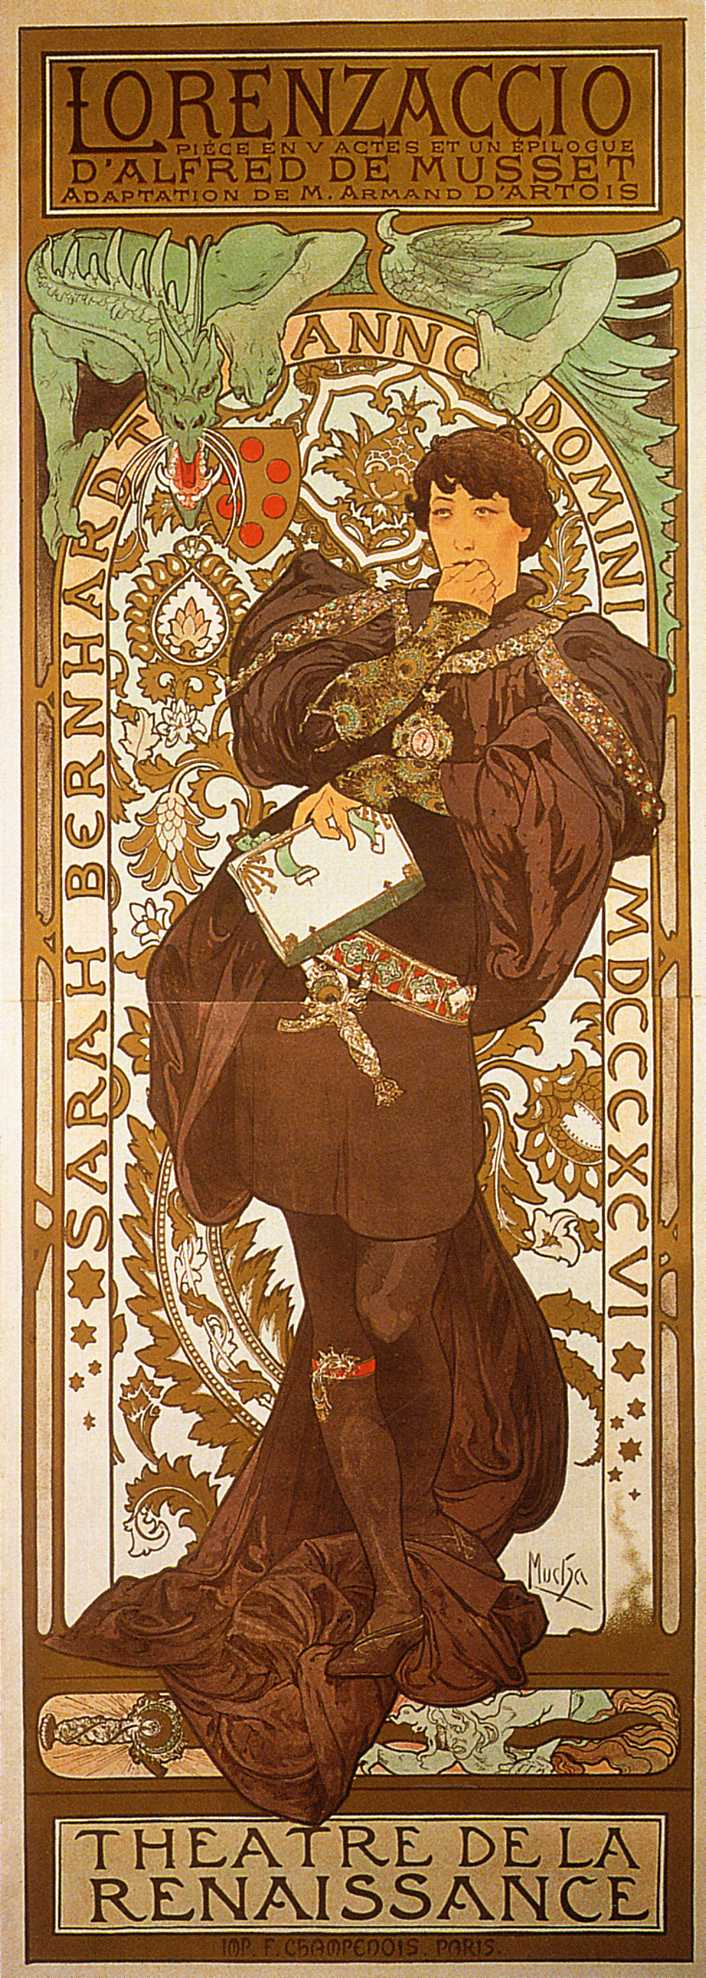 Рекламный плакат для Сары Бернар. Лорензачио-1896